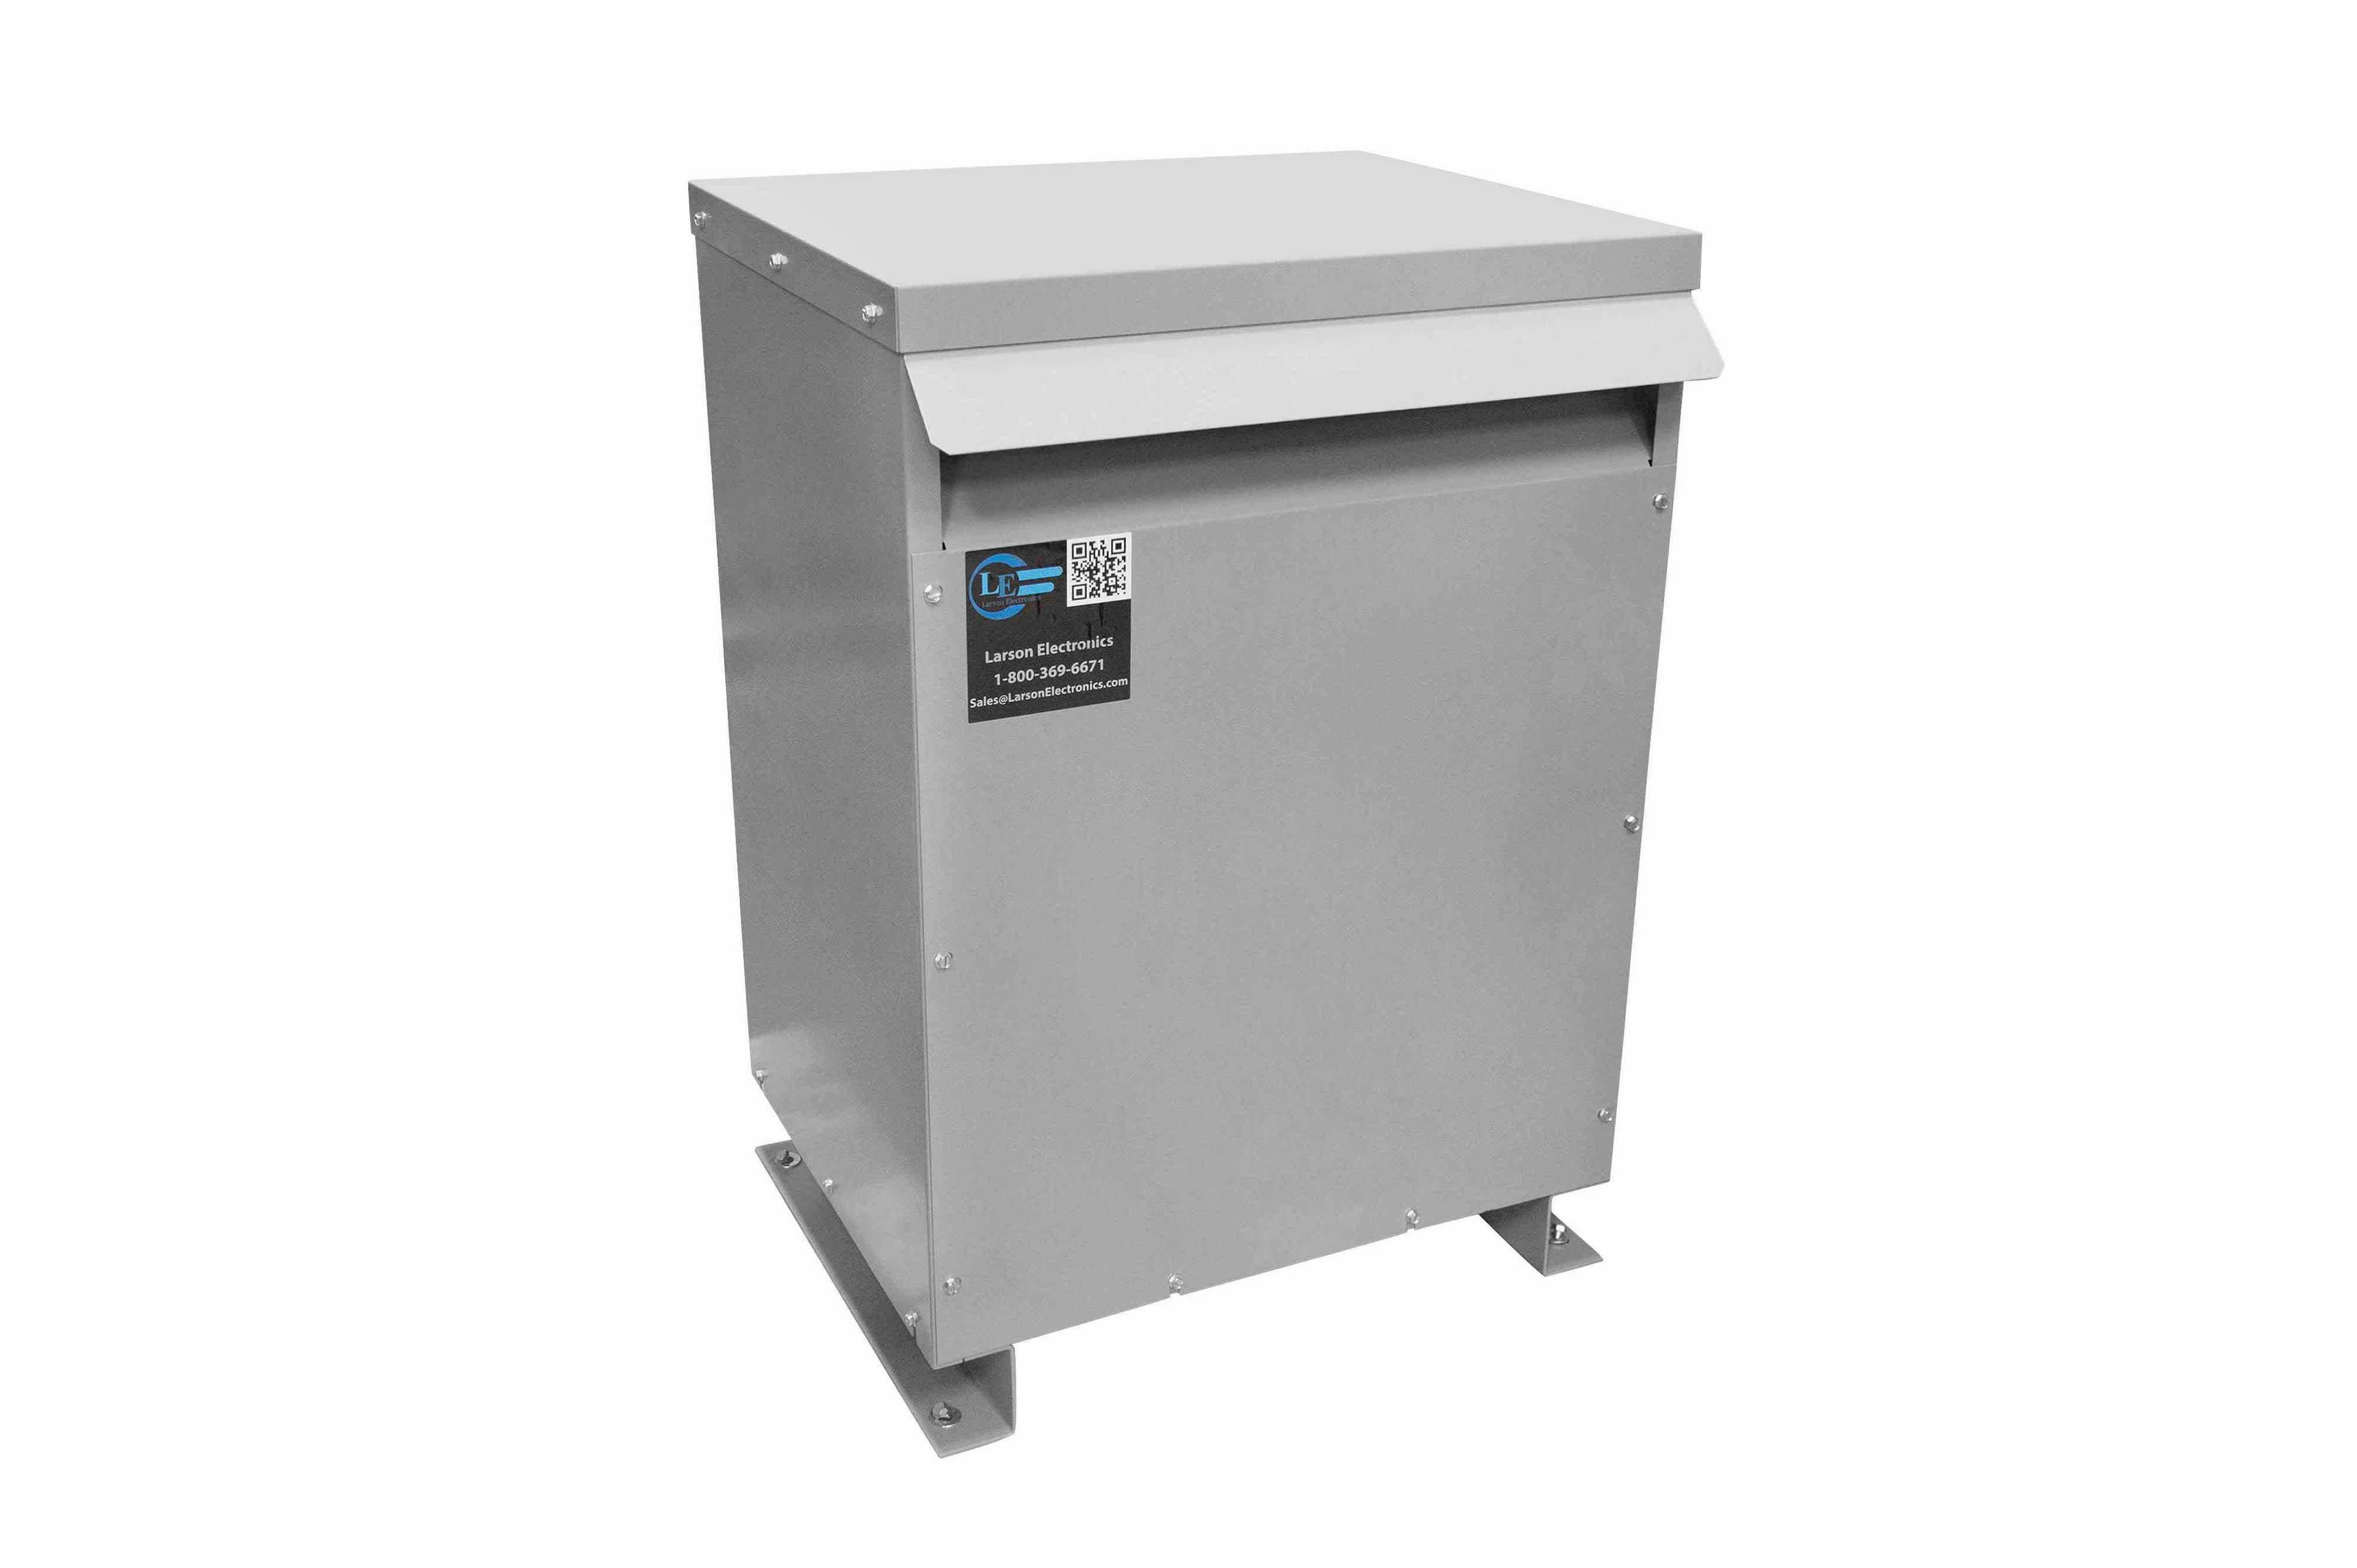 112.5 kVA 3PH Isolation Transformer, 460V Wye Primary, 575Y/332 Wye-N Secondary, N3R, Ventilated, 60 Hz